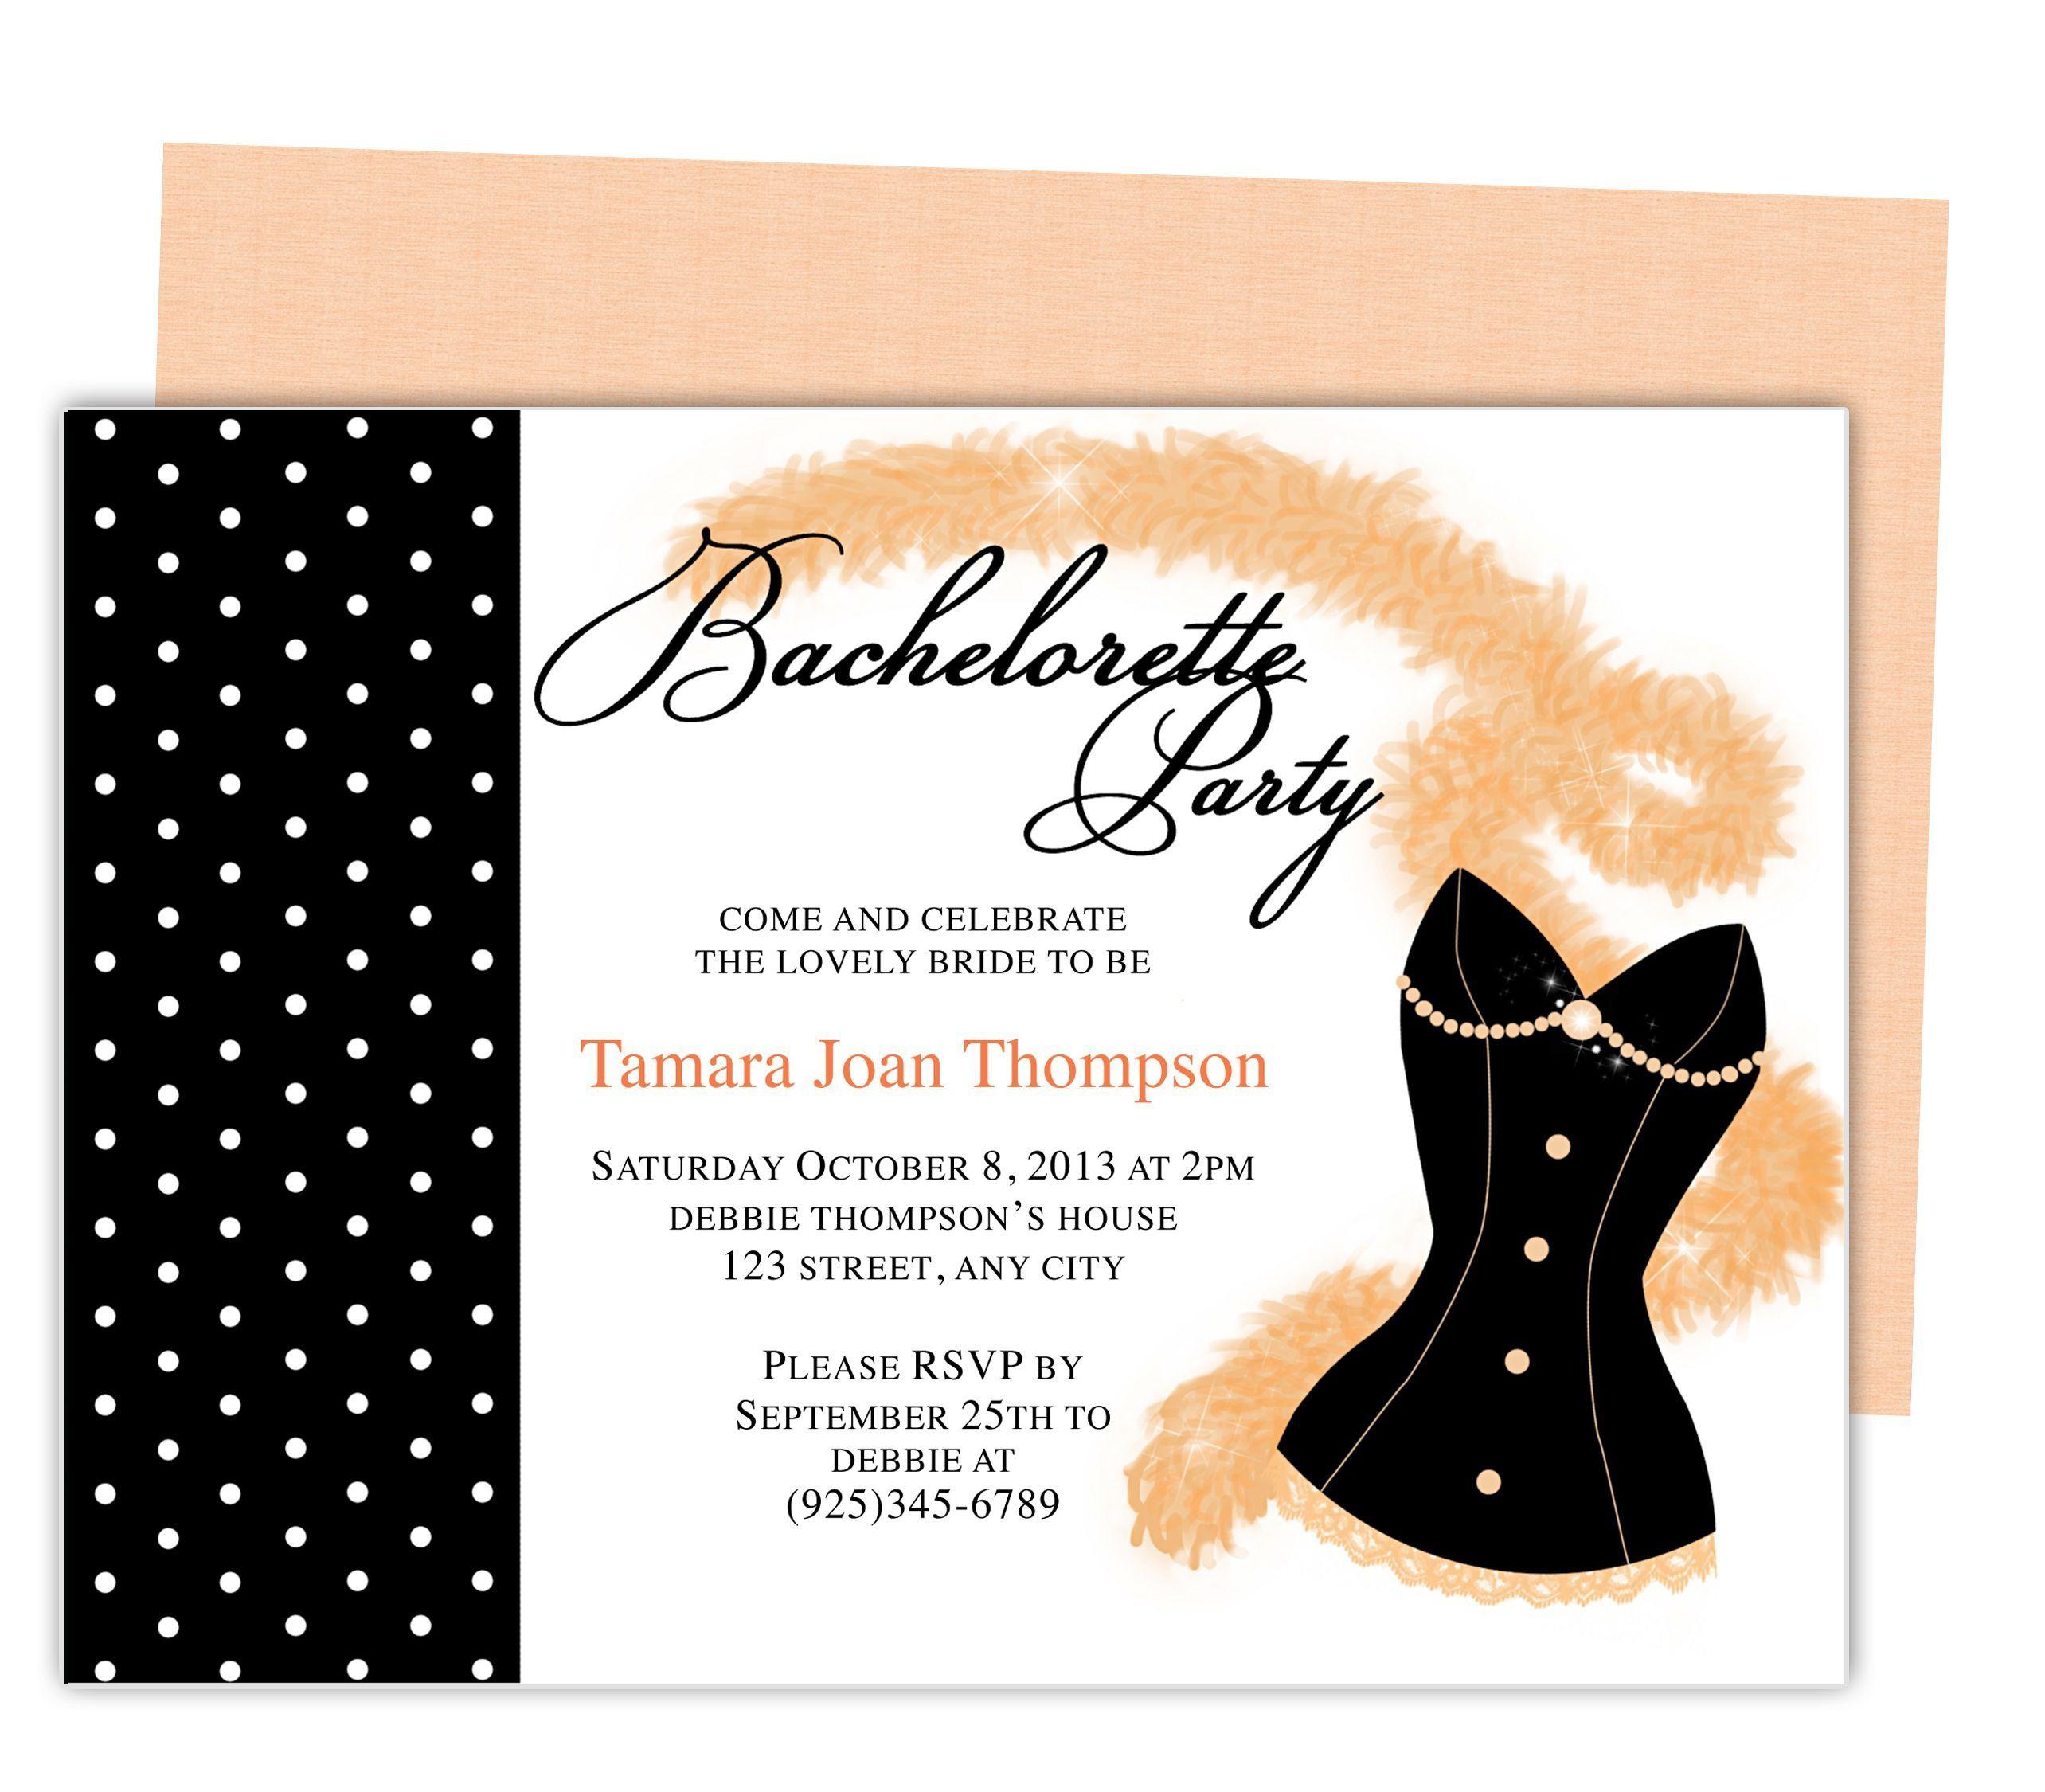 007 Stupendou Bachelorette Party Invitation Template Word Free Photo Full